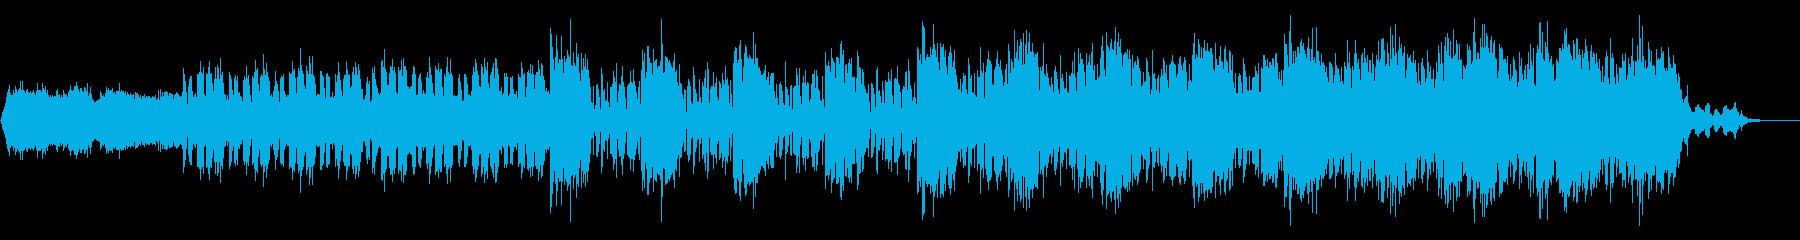 KANT混沌アンビエント20626の再生済みの波形